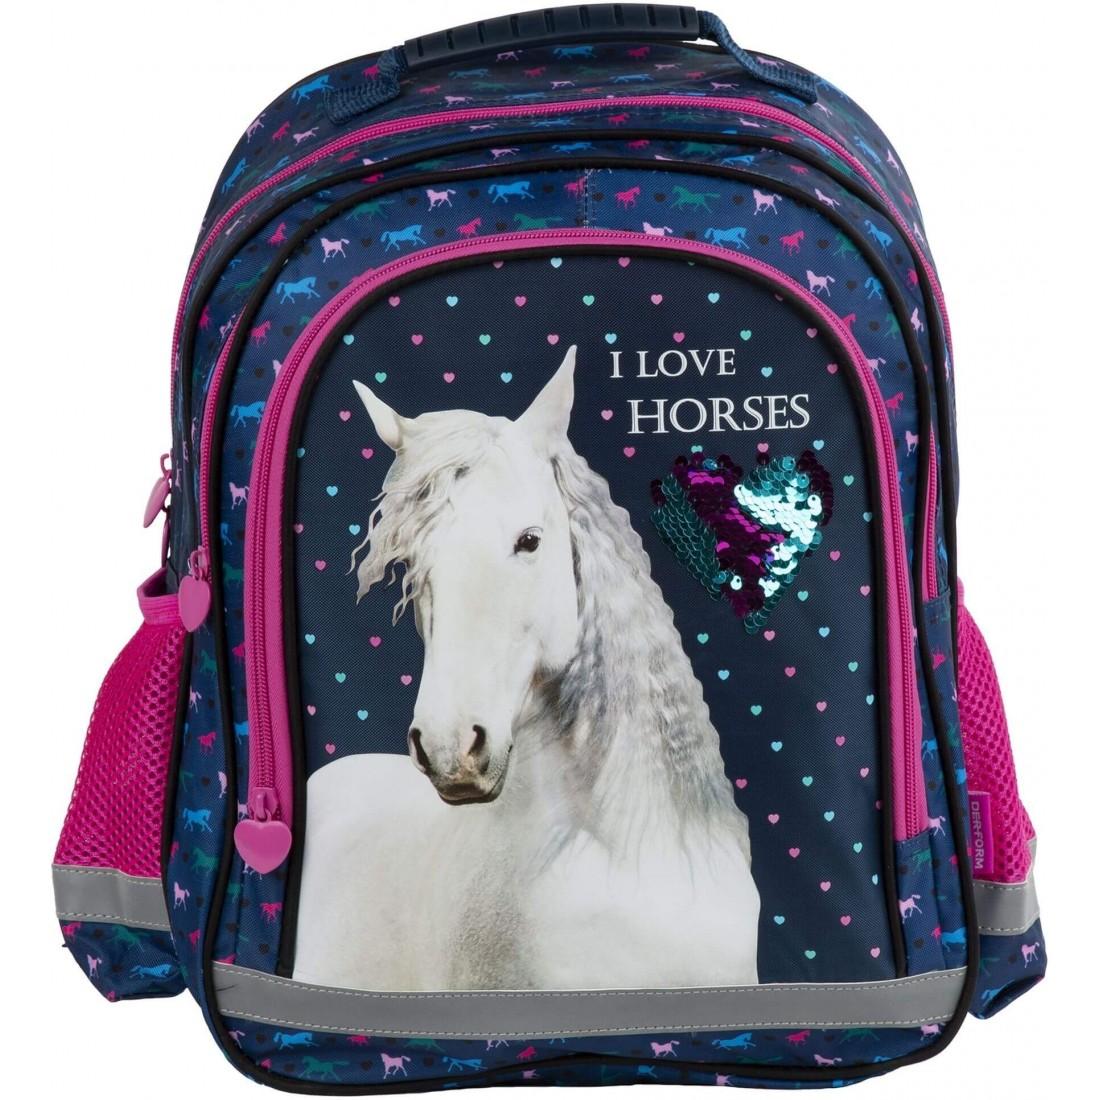 Plecak z koniem do 1 klasy I Love Horses granatowo-różowy z cekinami - plecak-tornister.pl